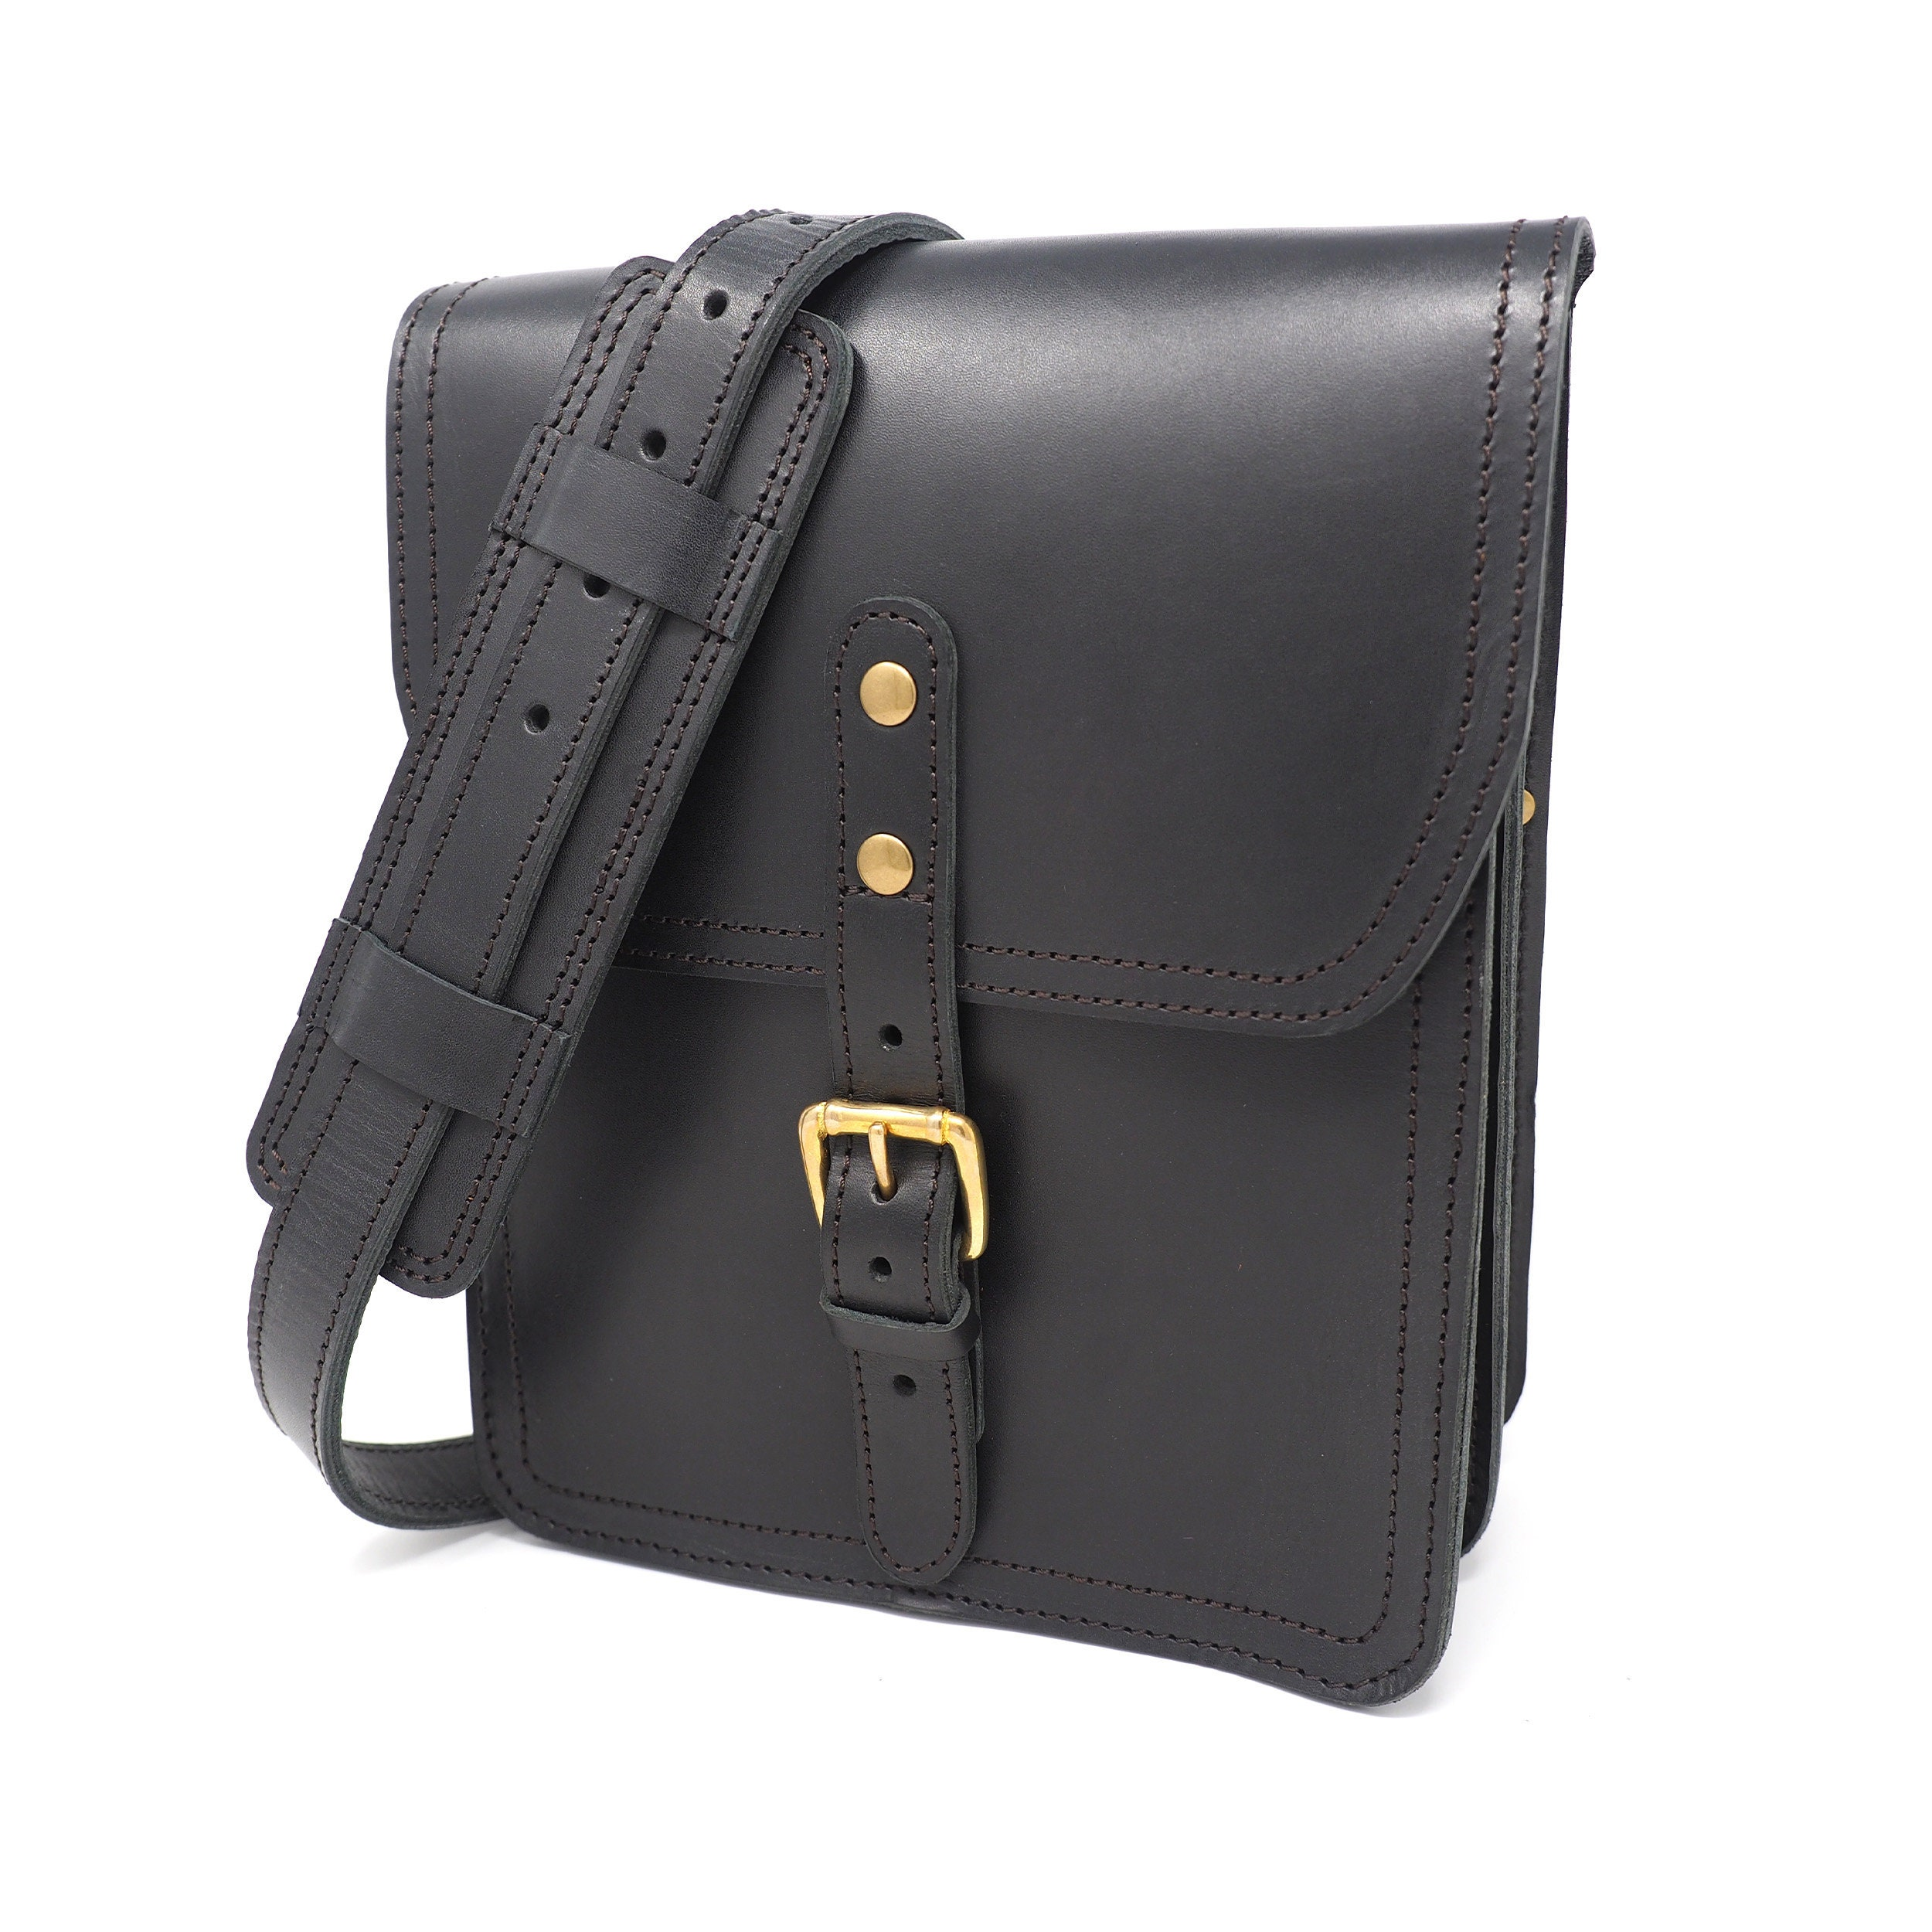 441d7f77c Black Vertical Leather Crossbody Bag for iPad Mens & Womens | Etsy